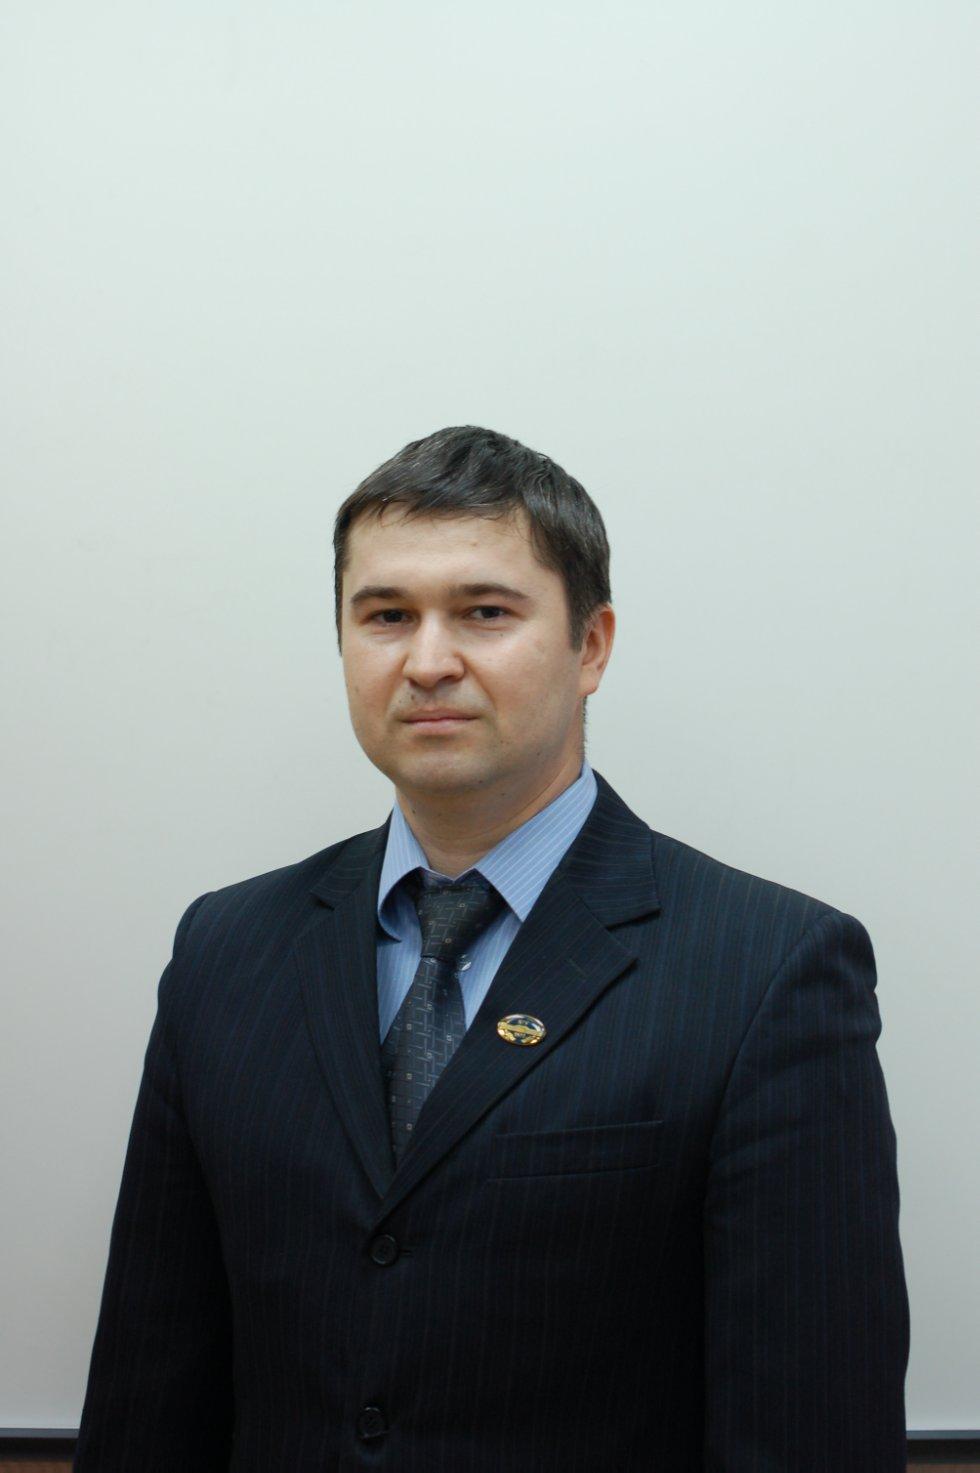 Галиуллин Марат Зуфарович